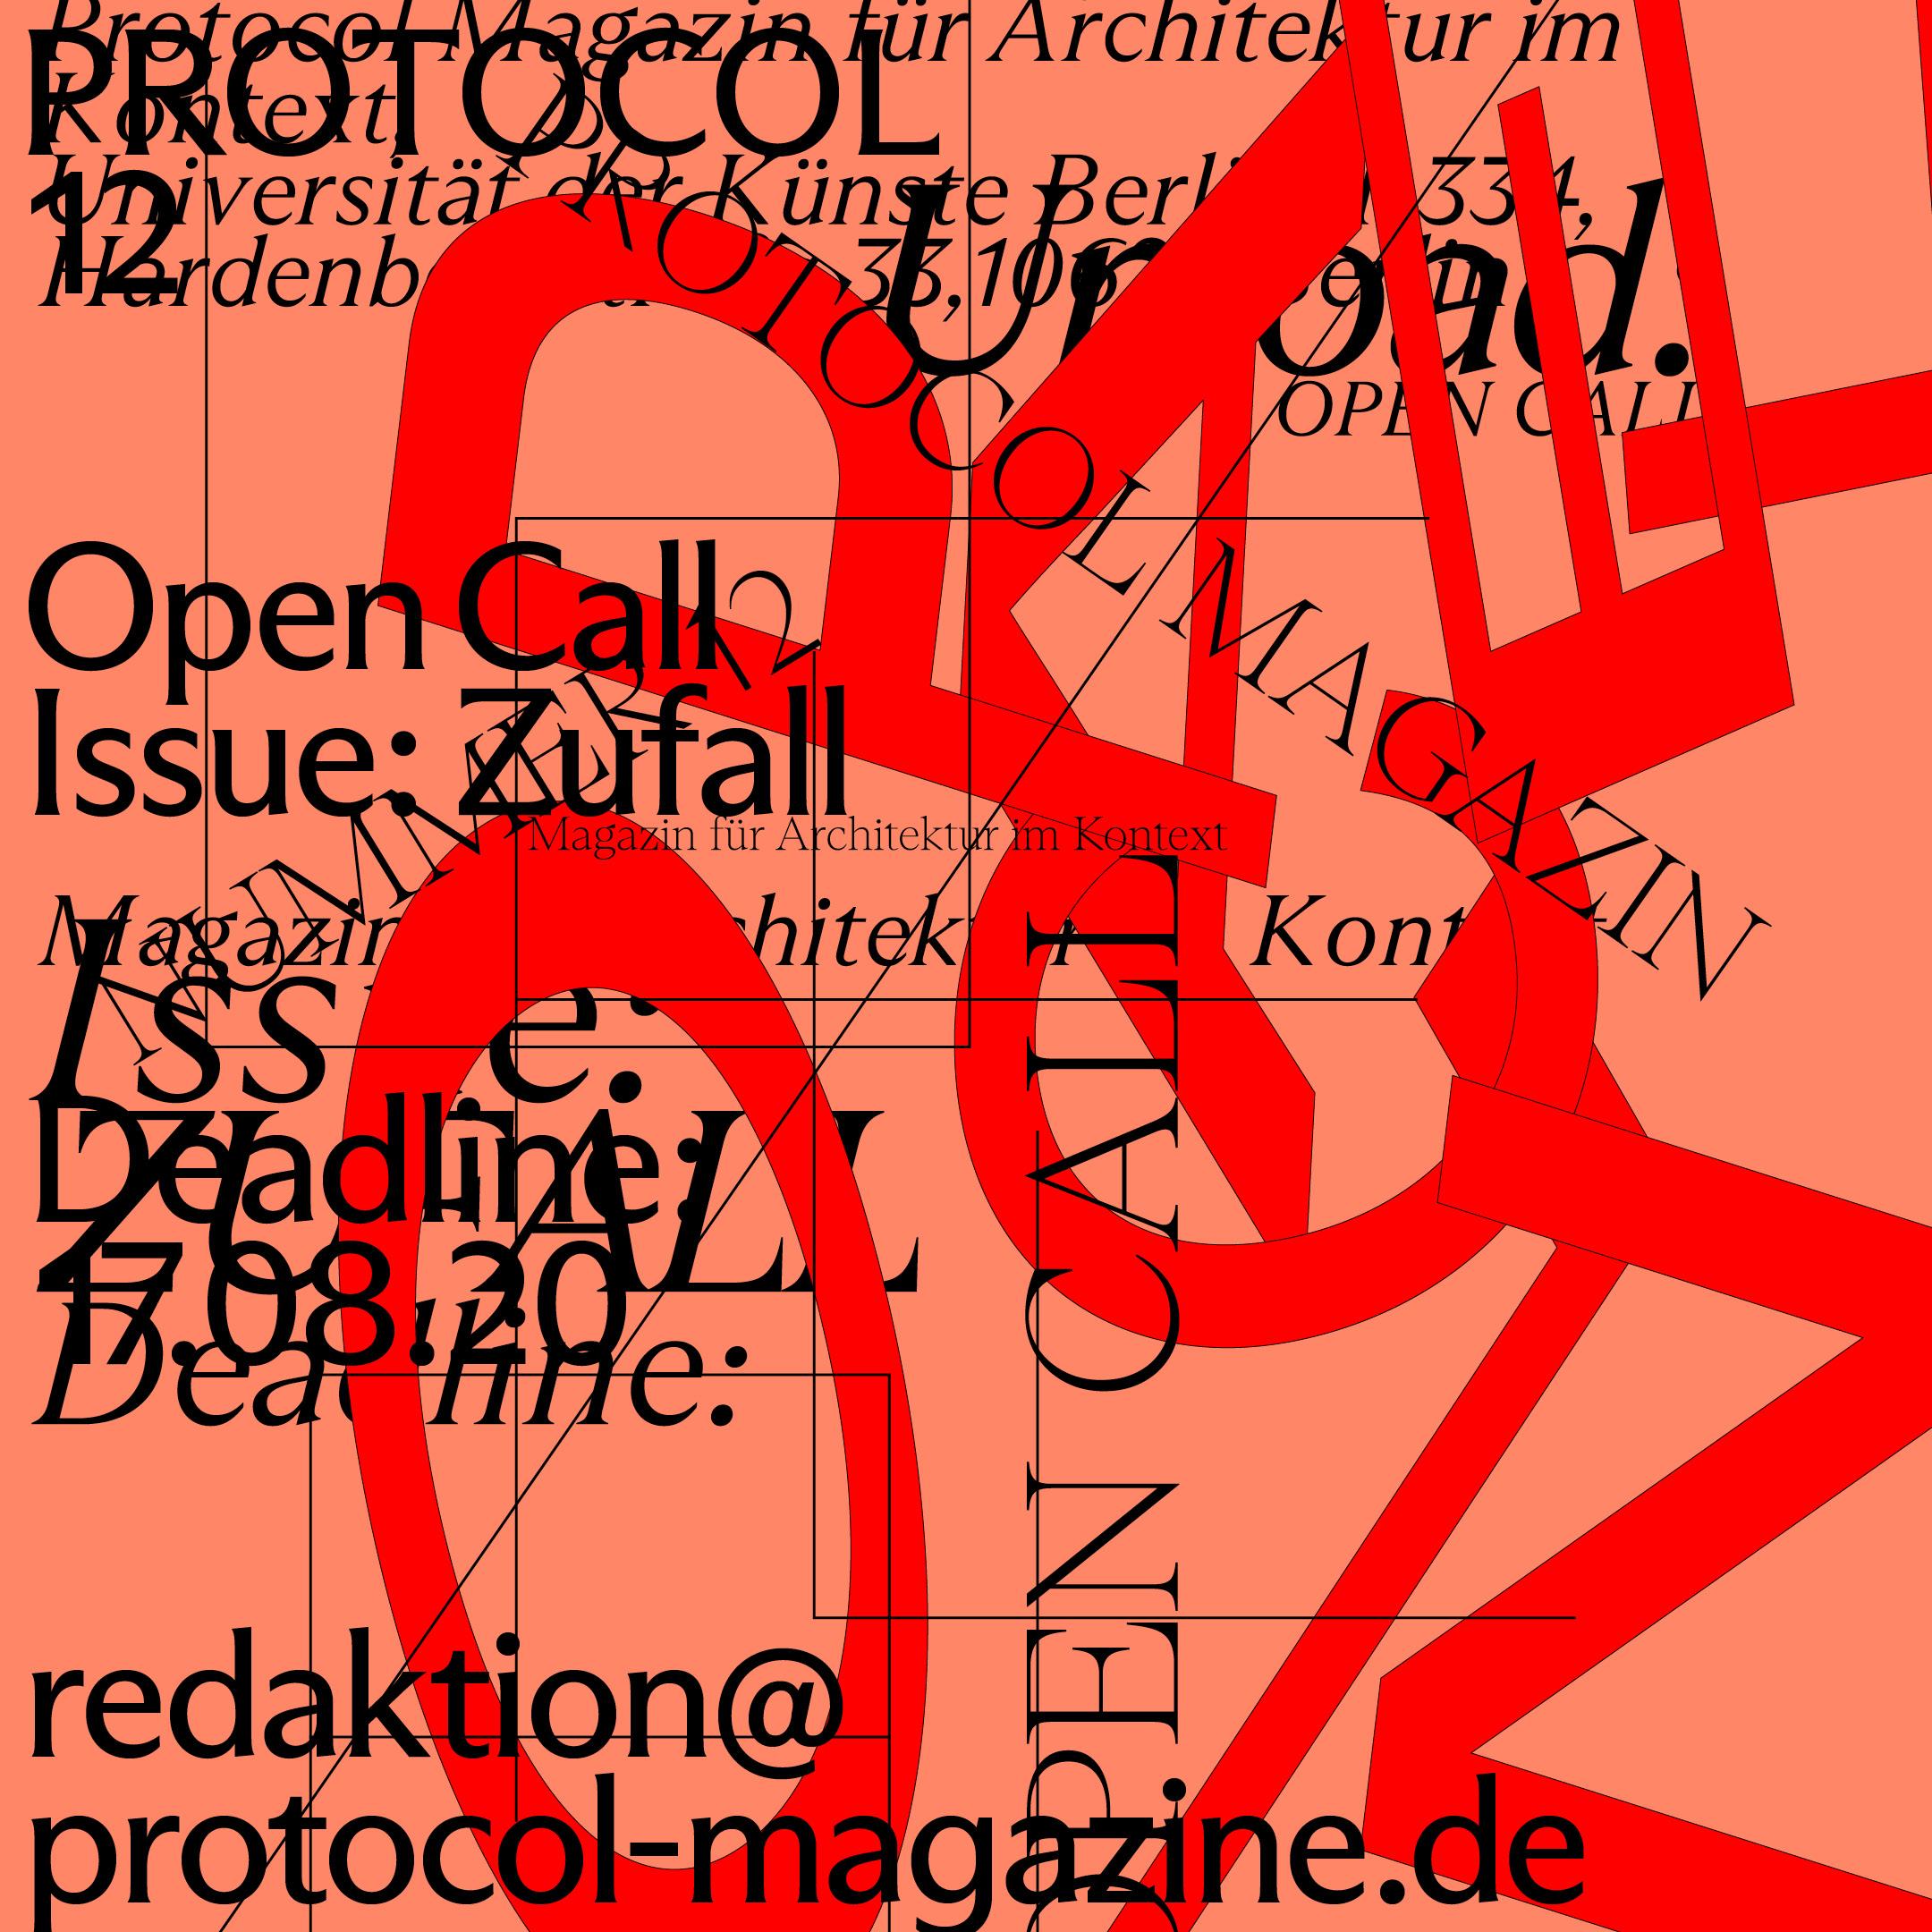 p12_Instagram-Redaktion_Protocol-Magazin_Magazin-fuer-Architektur-im-Kontext4